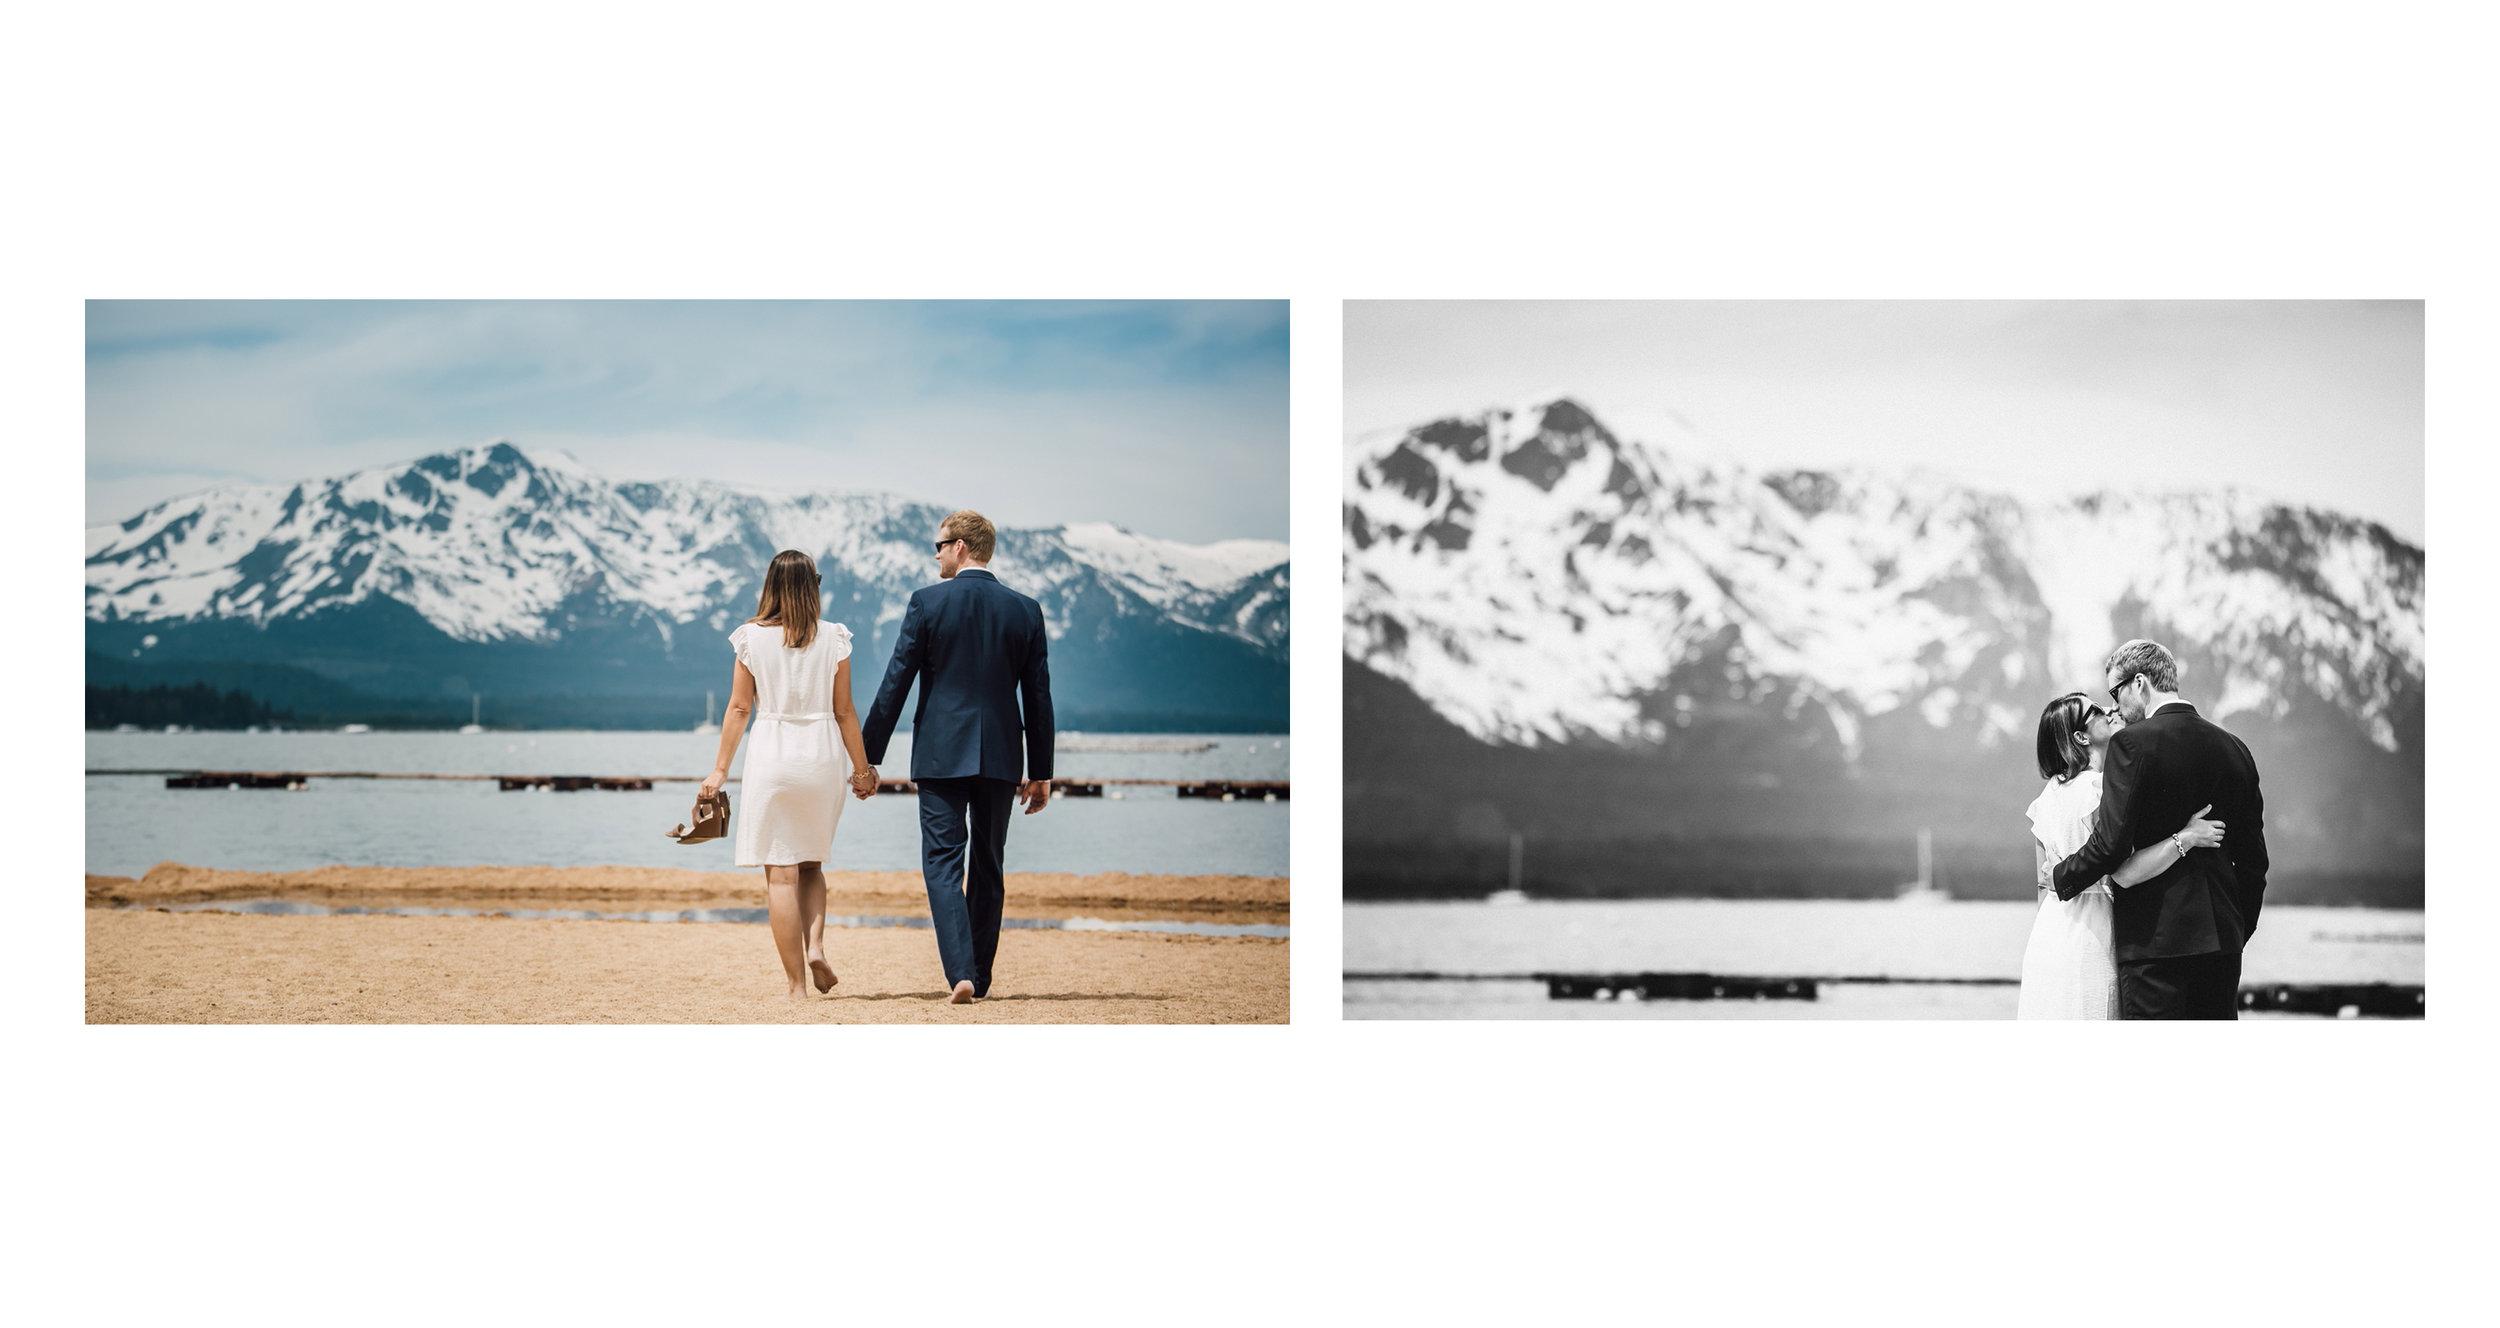 Melisa&David_Wedding_Day_005.jpg